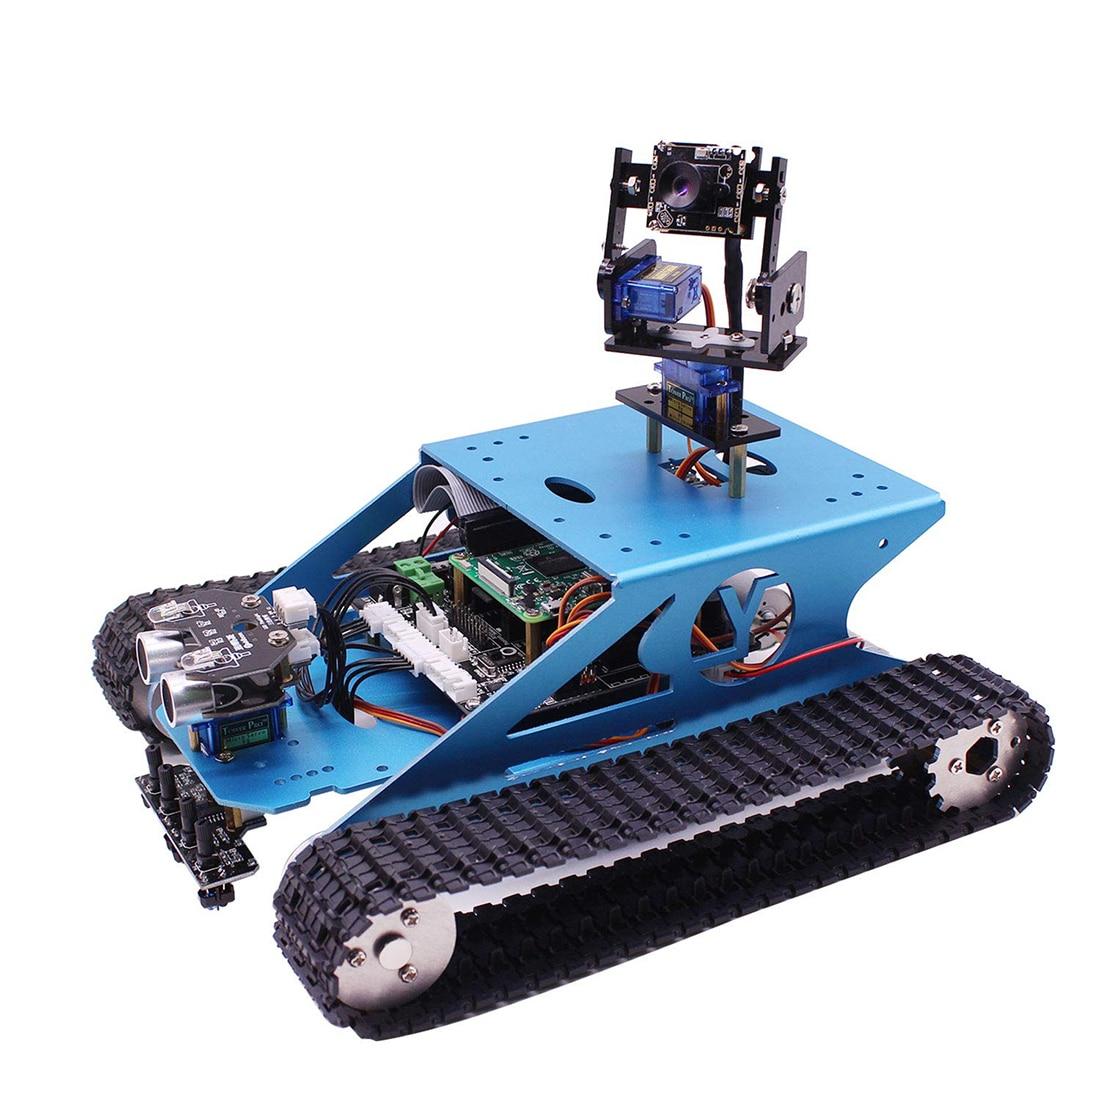 Professional Raspberry Pi Tank Smart Robot Kit WiFi Wireless Video Programming Electronic DIY Model Building Block Kit for Adult